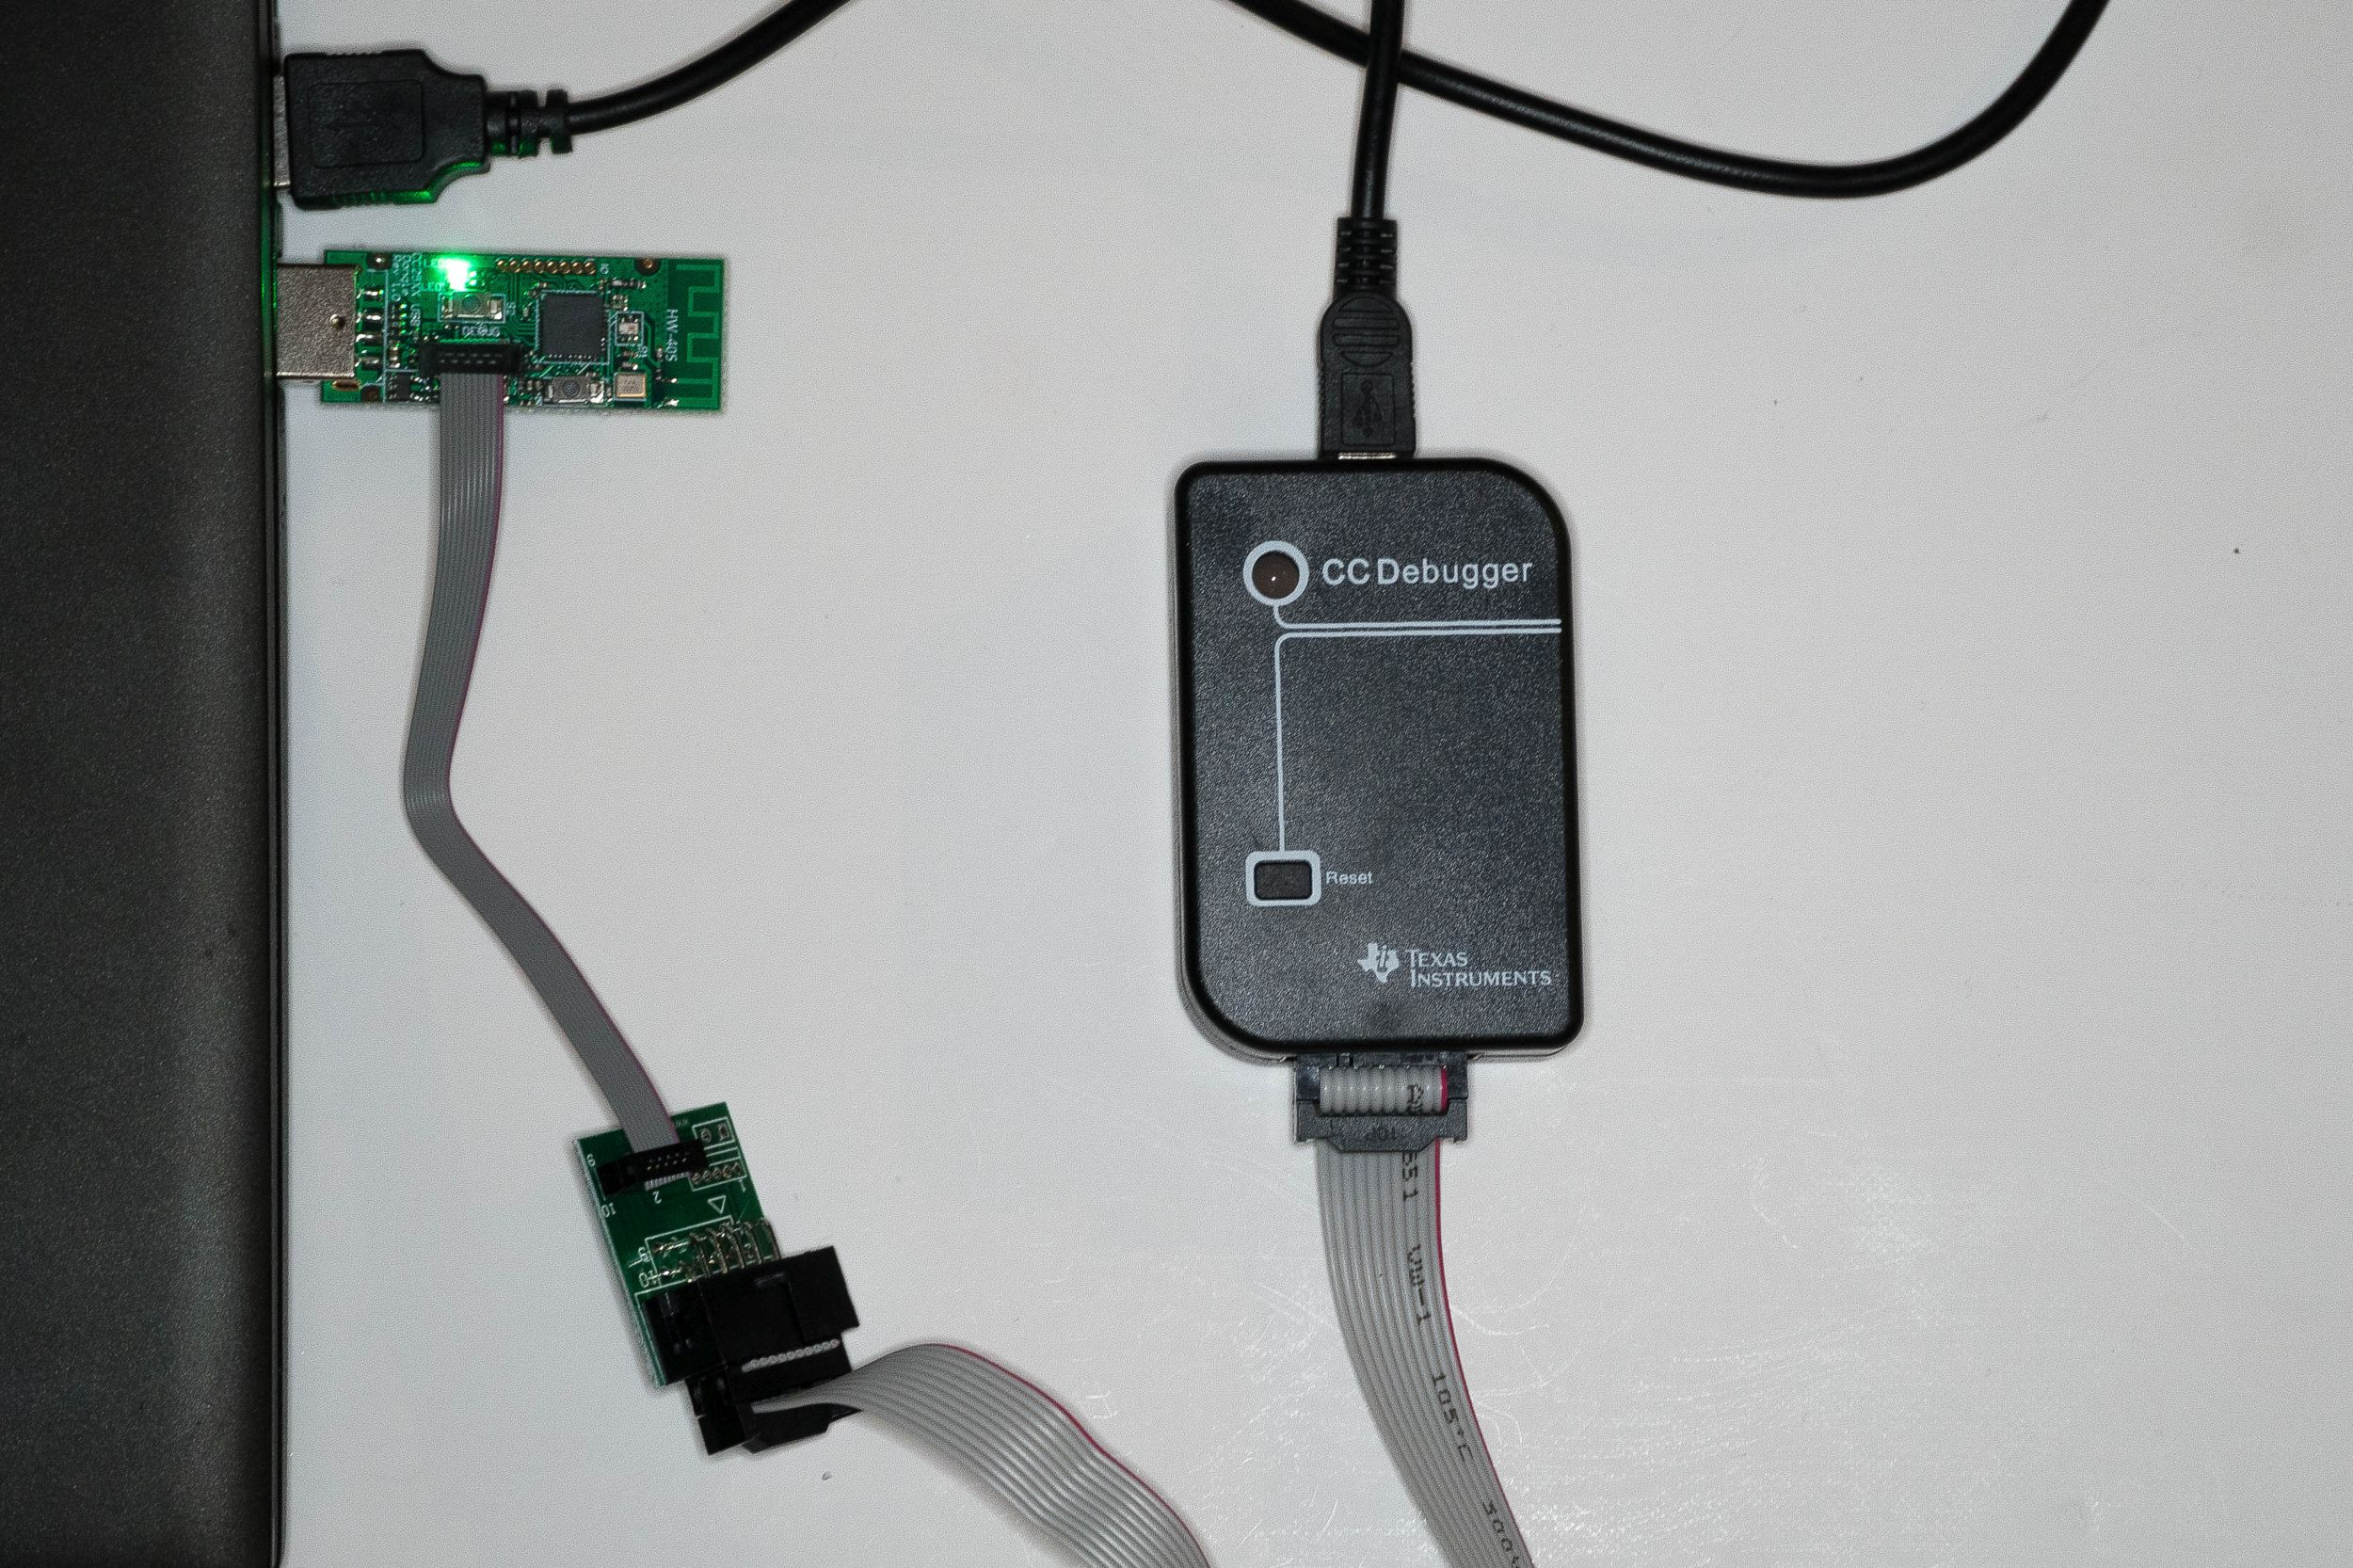 CC2531, CC-Debugger und PC verbinden